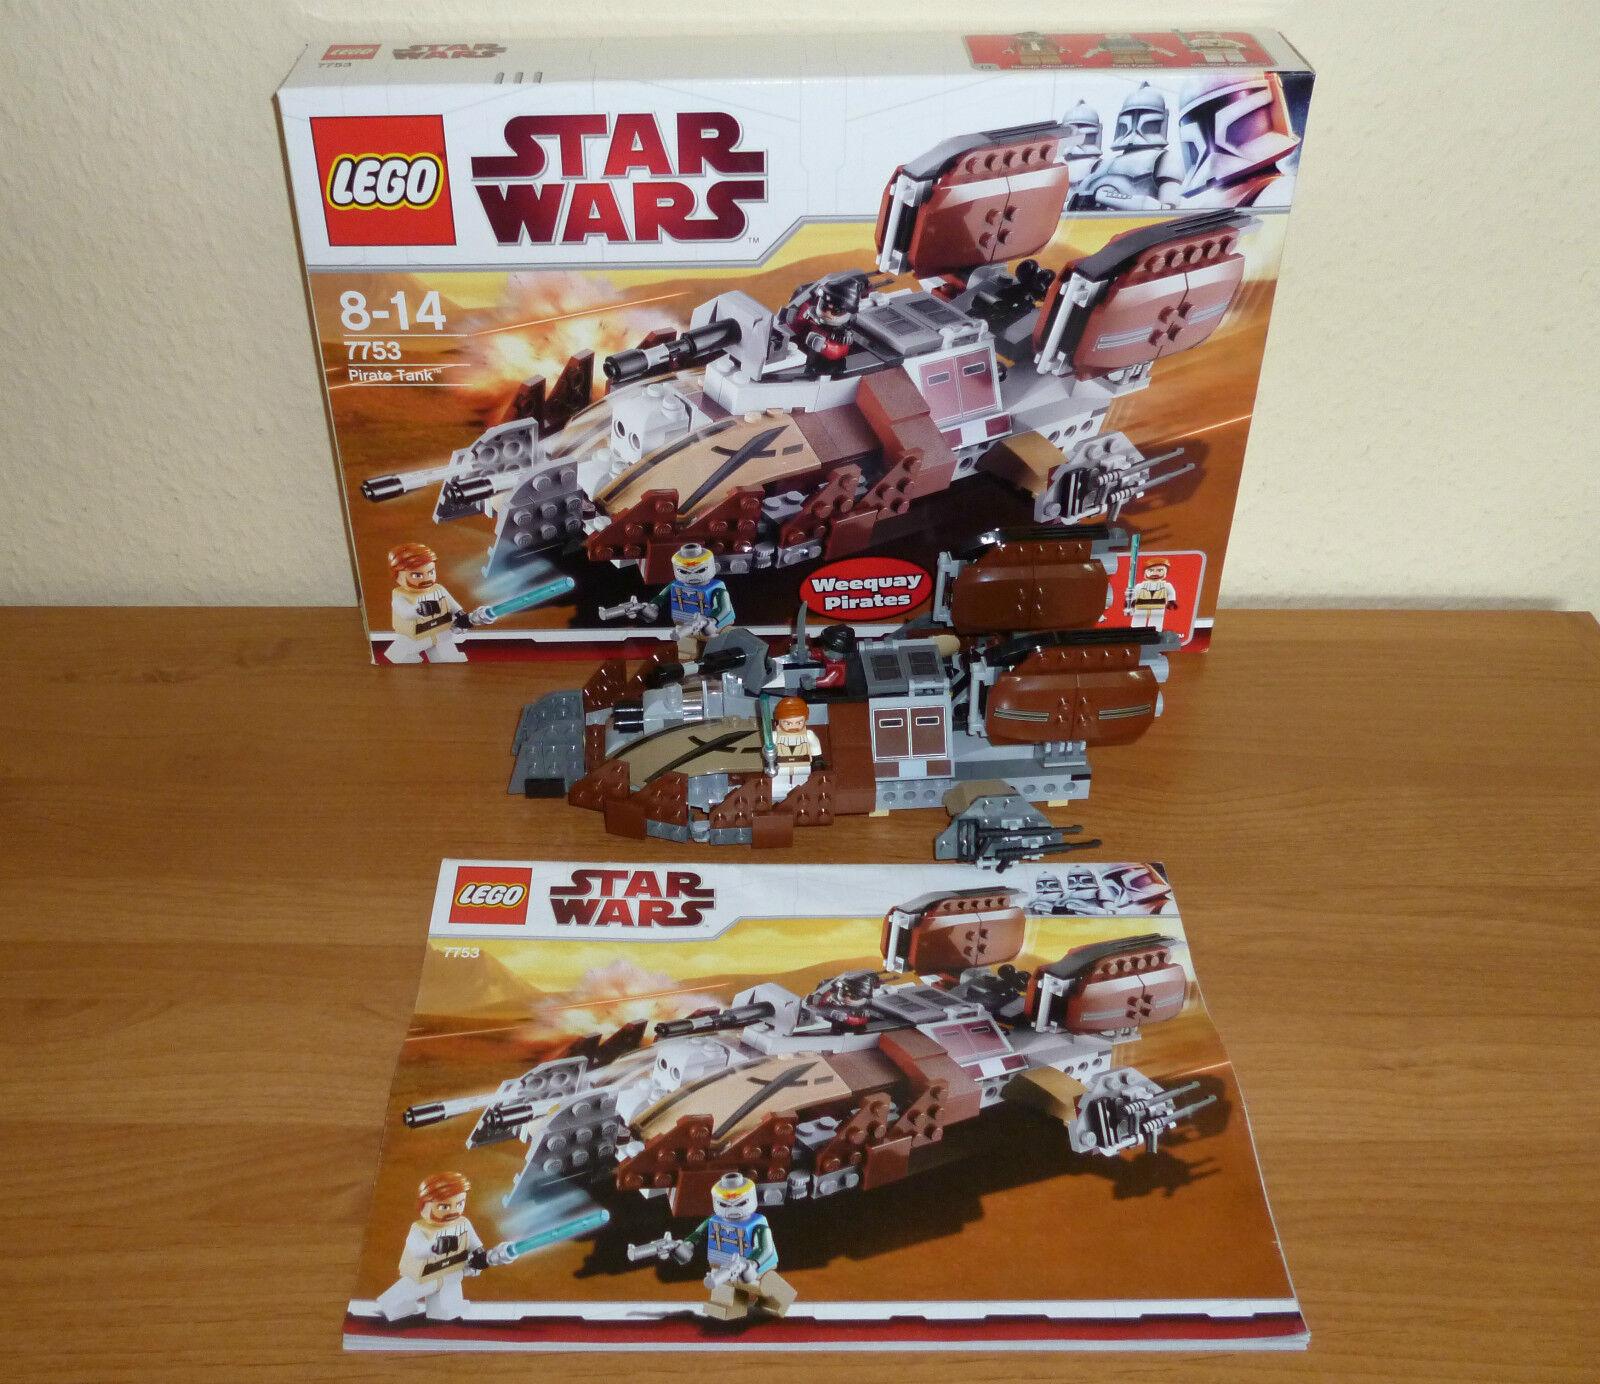 LEGO STAR WARS # 7753 Pirate Tank, complèteHommes t t t dans neuf dans sa boîte 1deb85